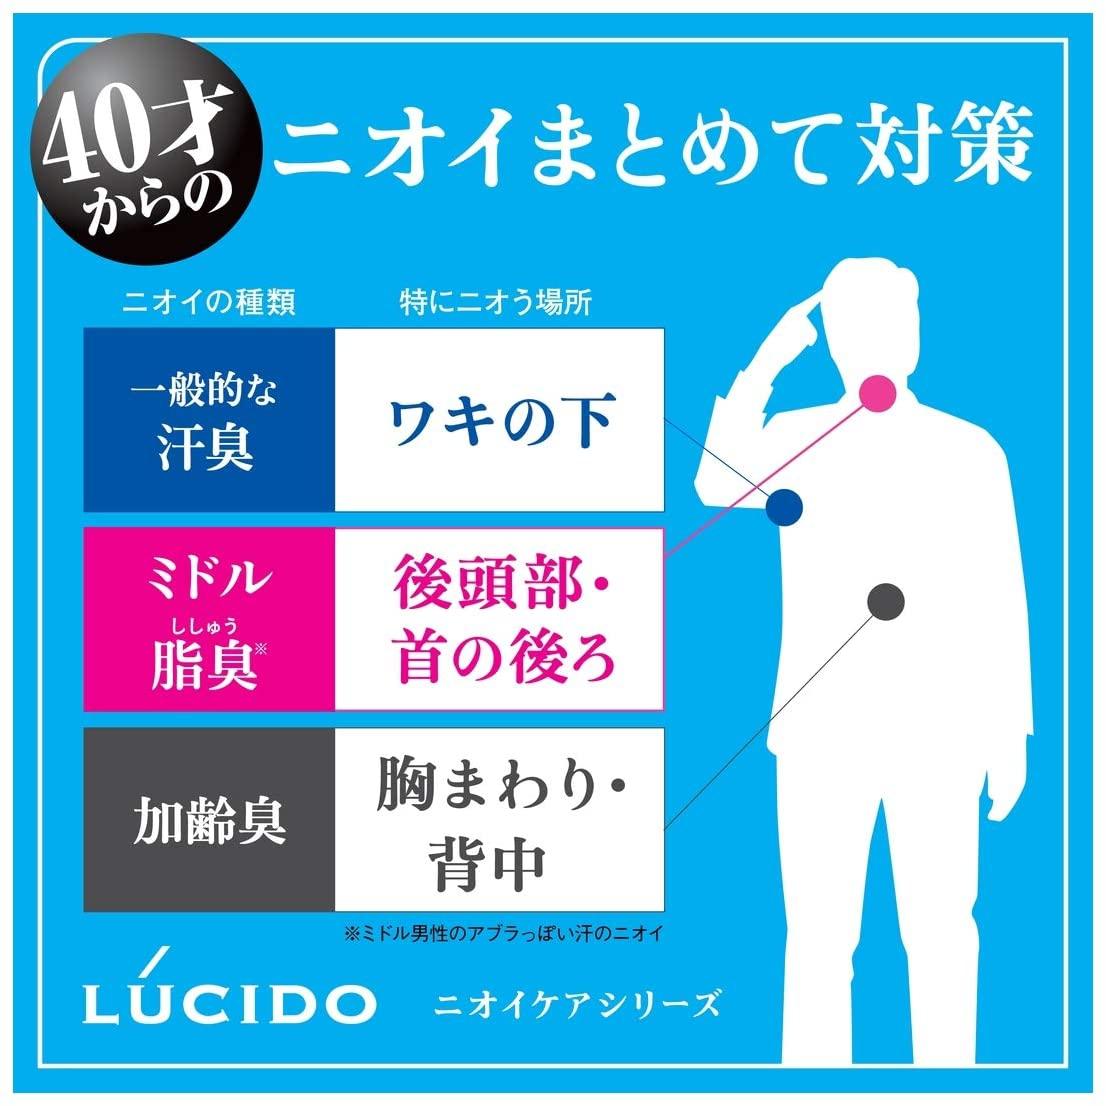 LUCIDO(ルシード) 薬用デオドラント高密着スティックの商品画像5